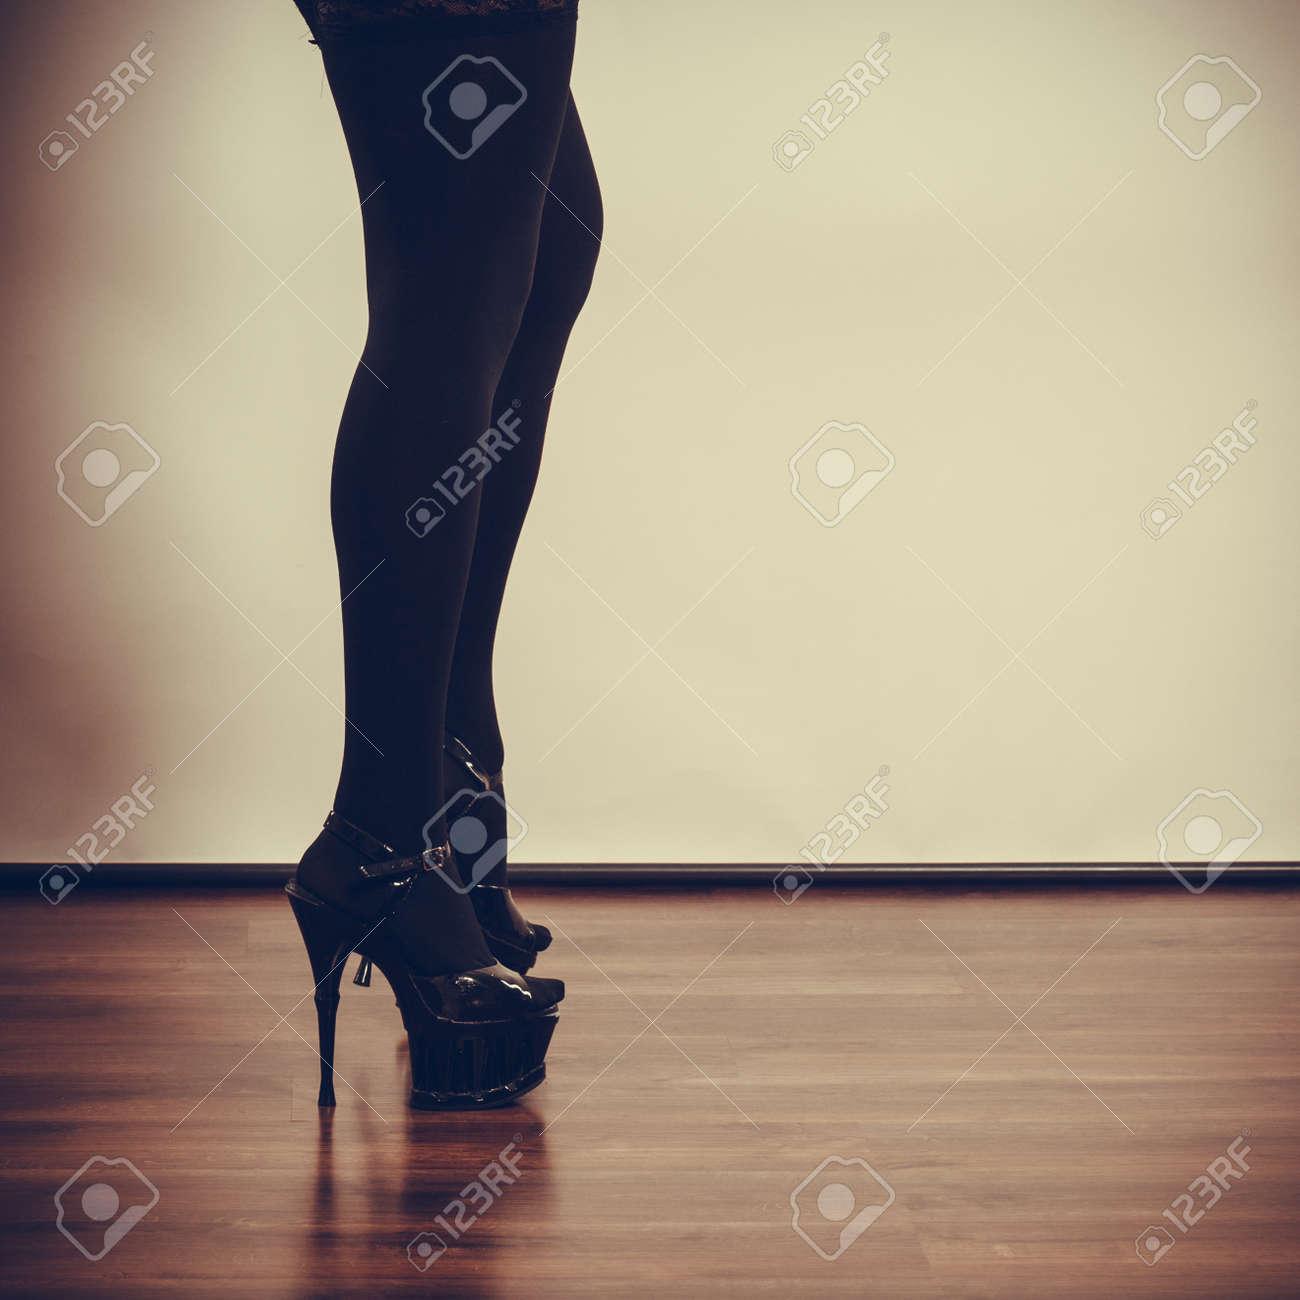 690a18a9142 스톡 콘텐츠 - 여성의 성행위. 검은 섹시한 스타킹을 입고 부분 본문 여자. 하이힐에 긴 여성 다리.